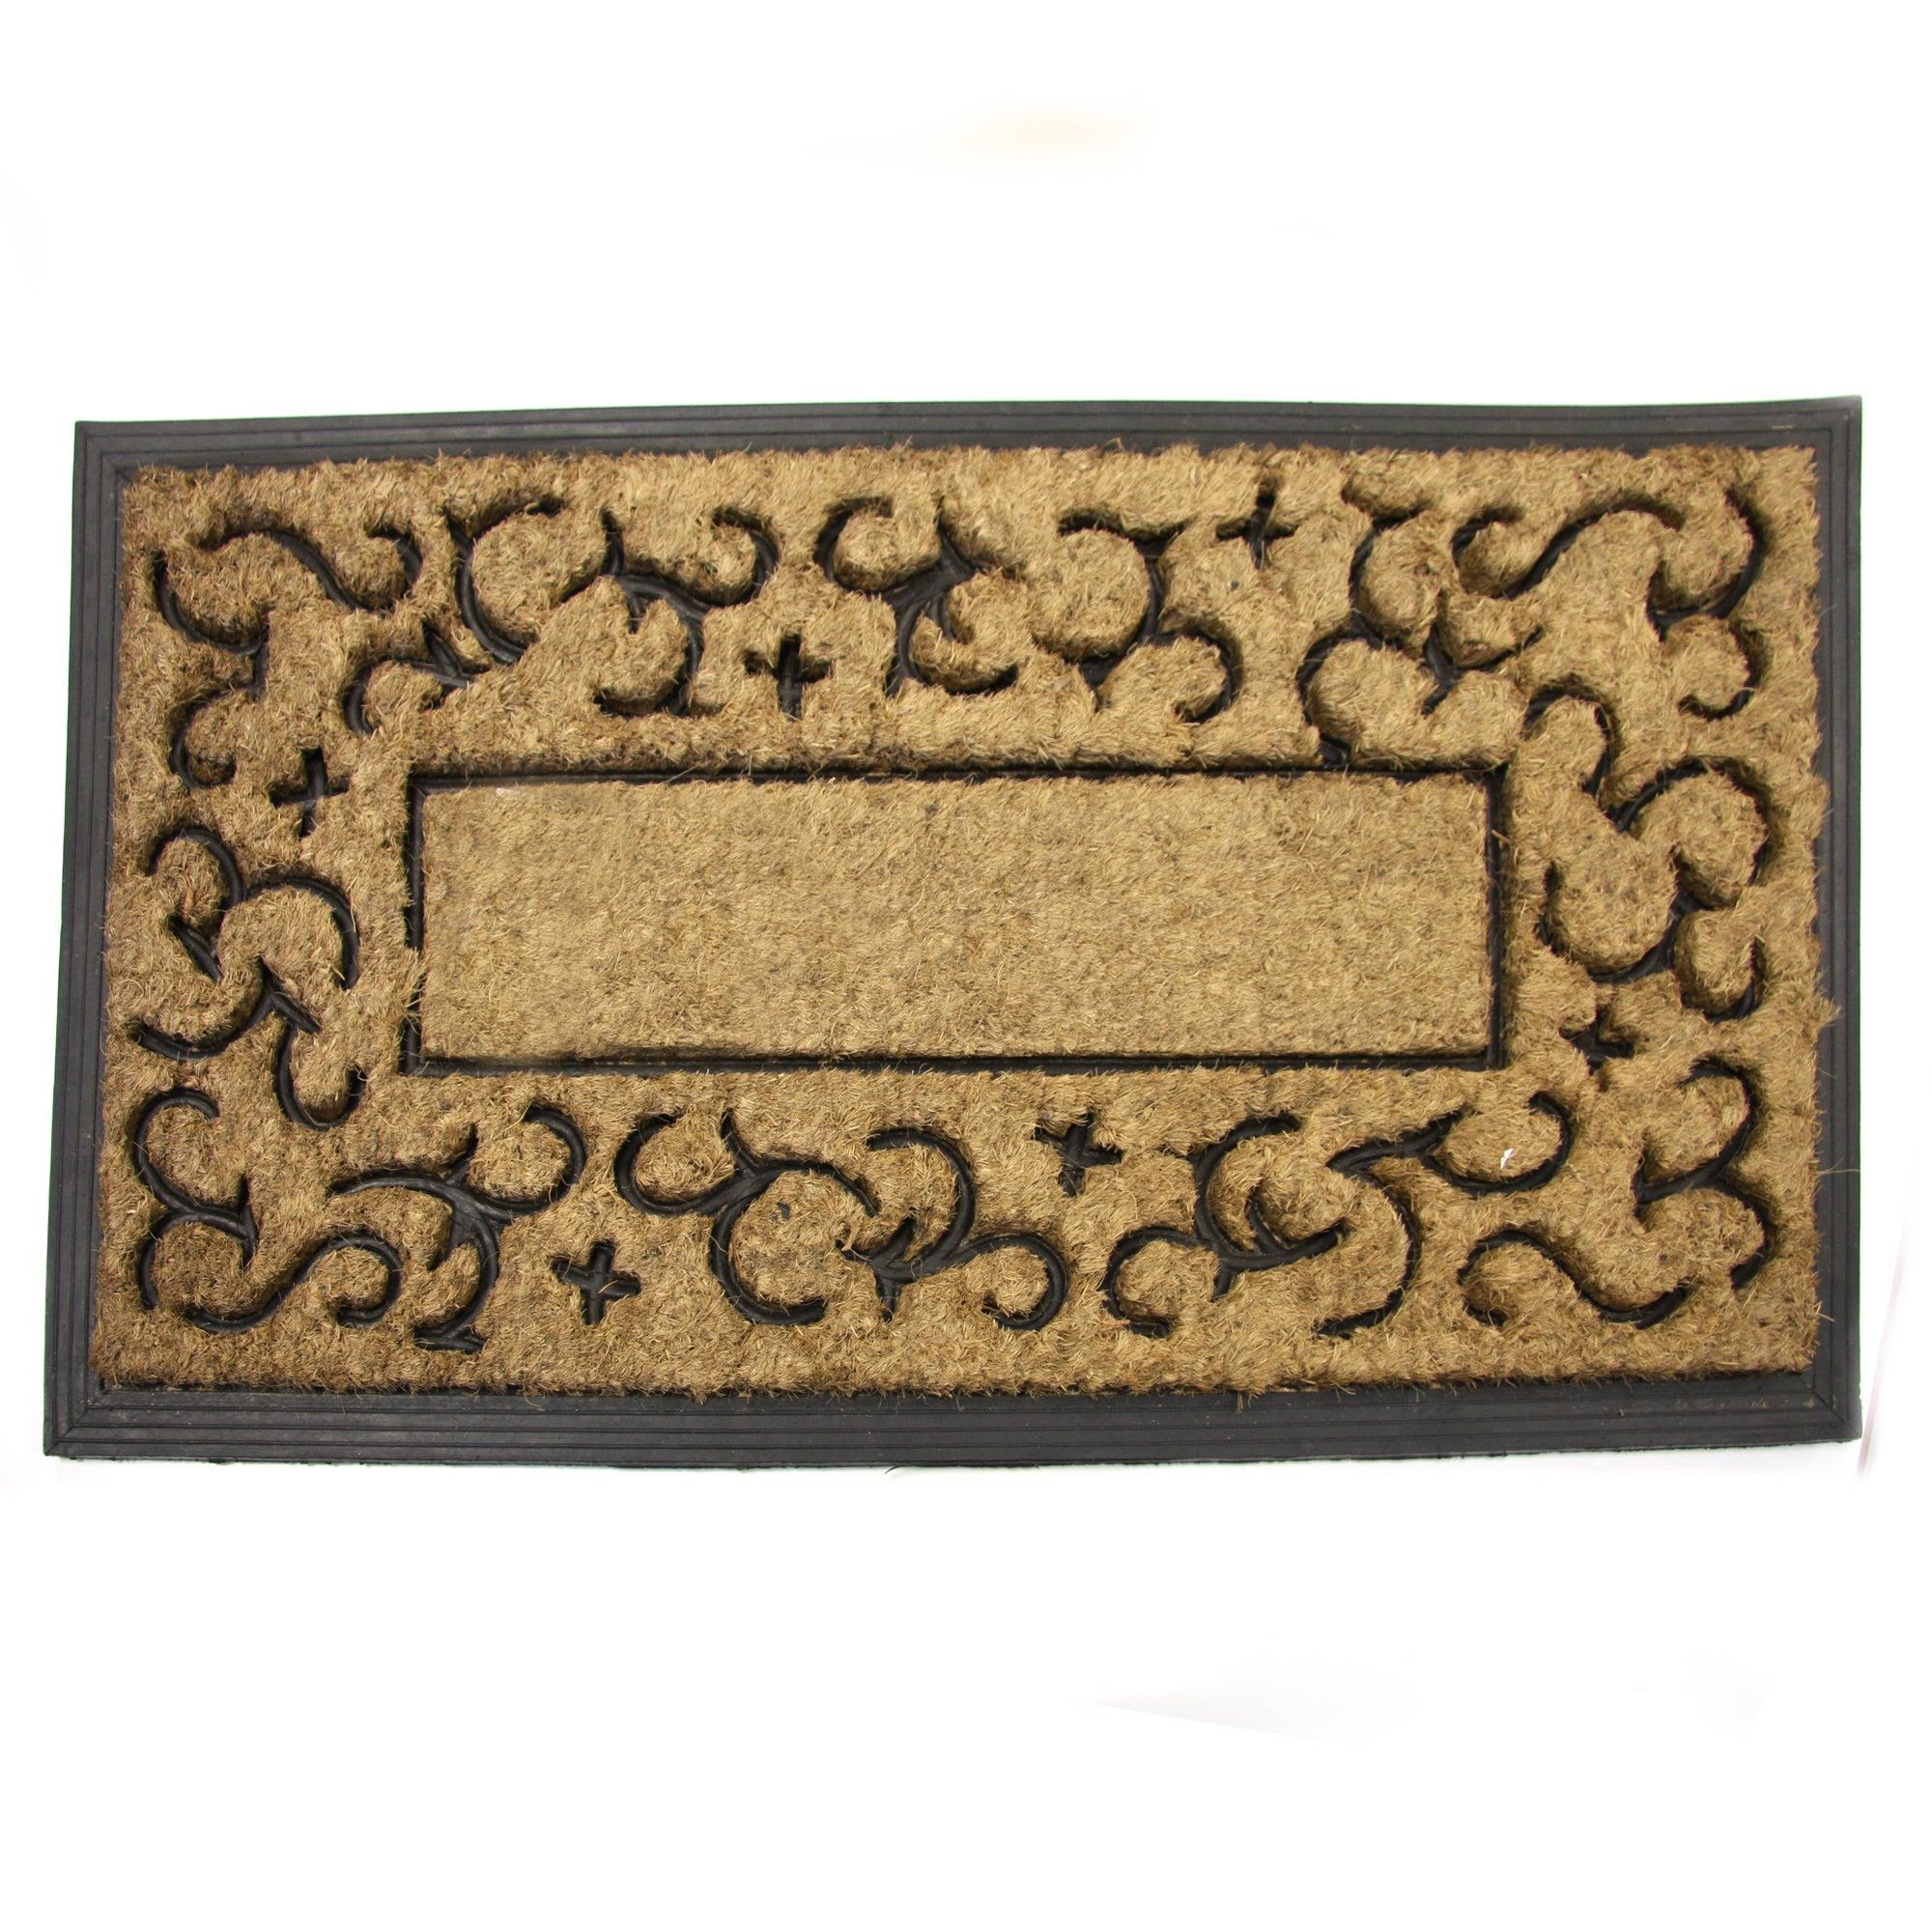 Medieval Doormat